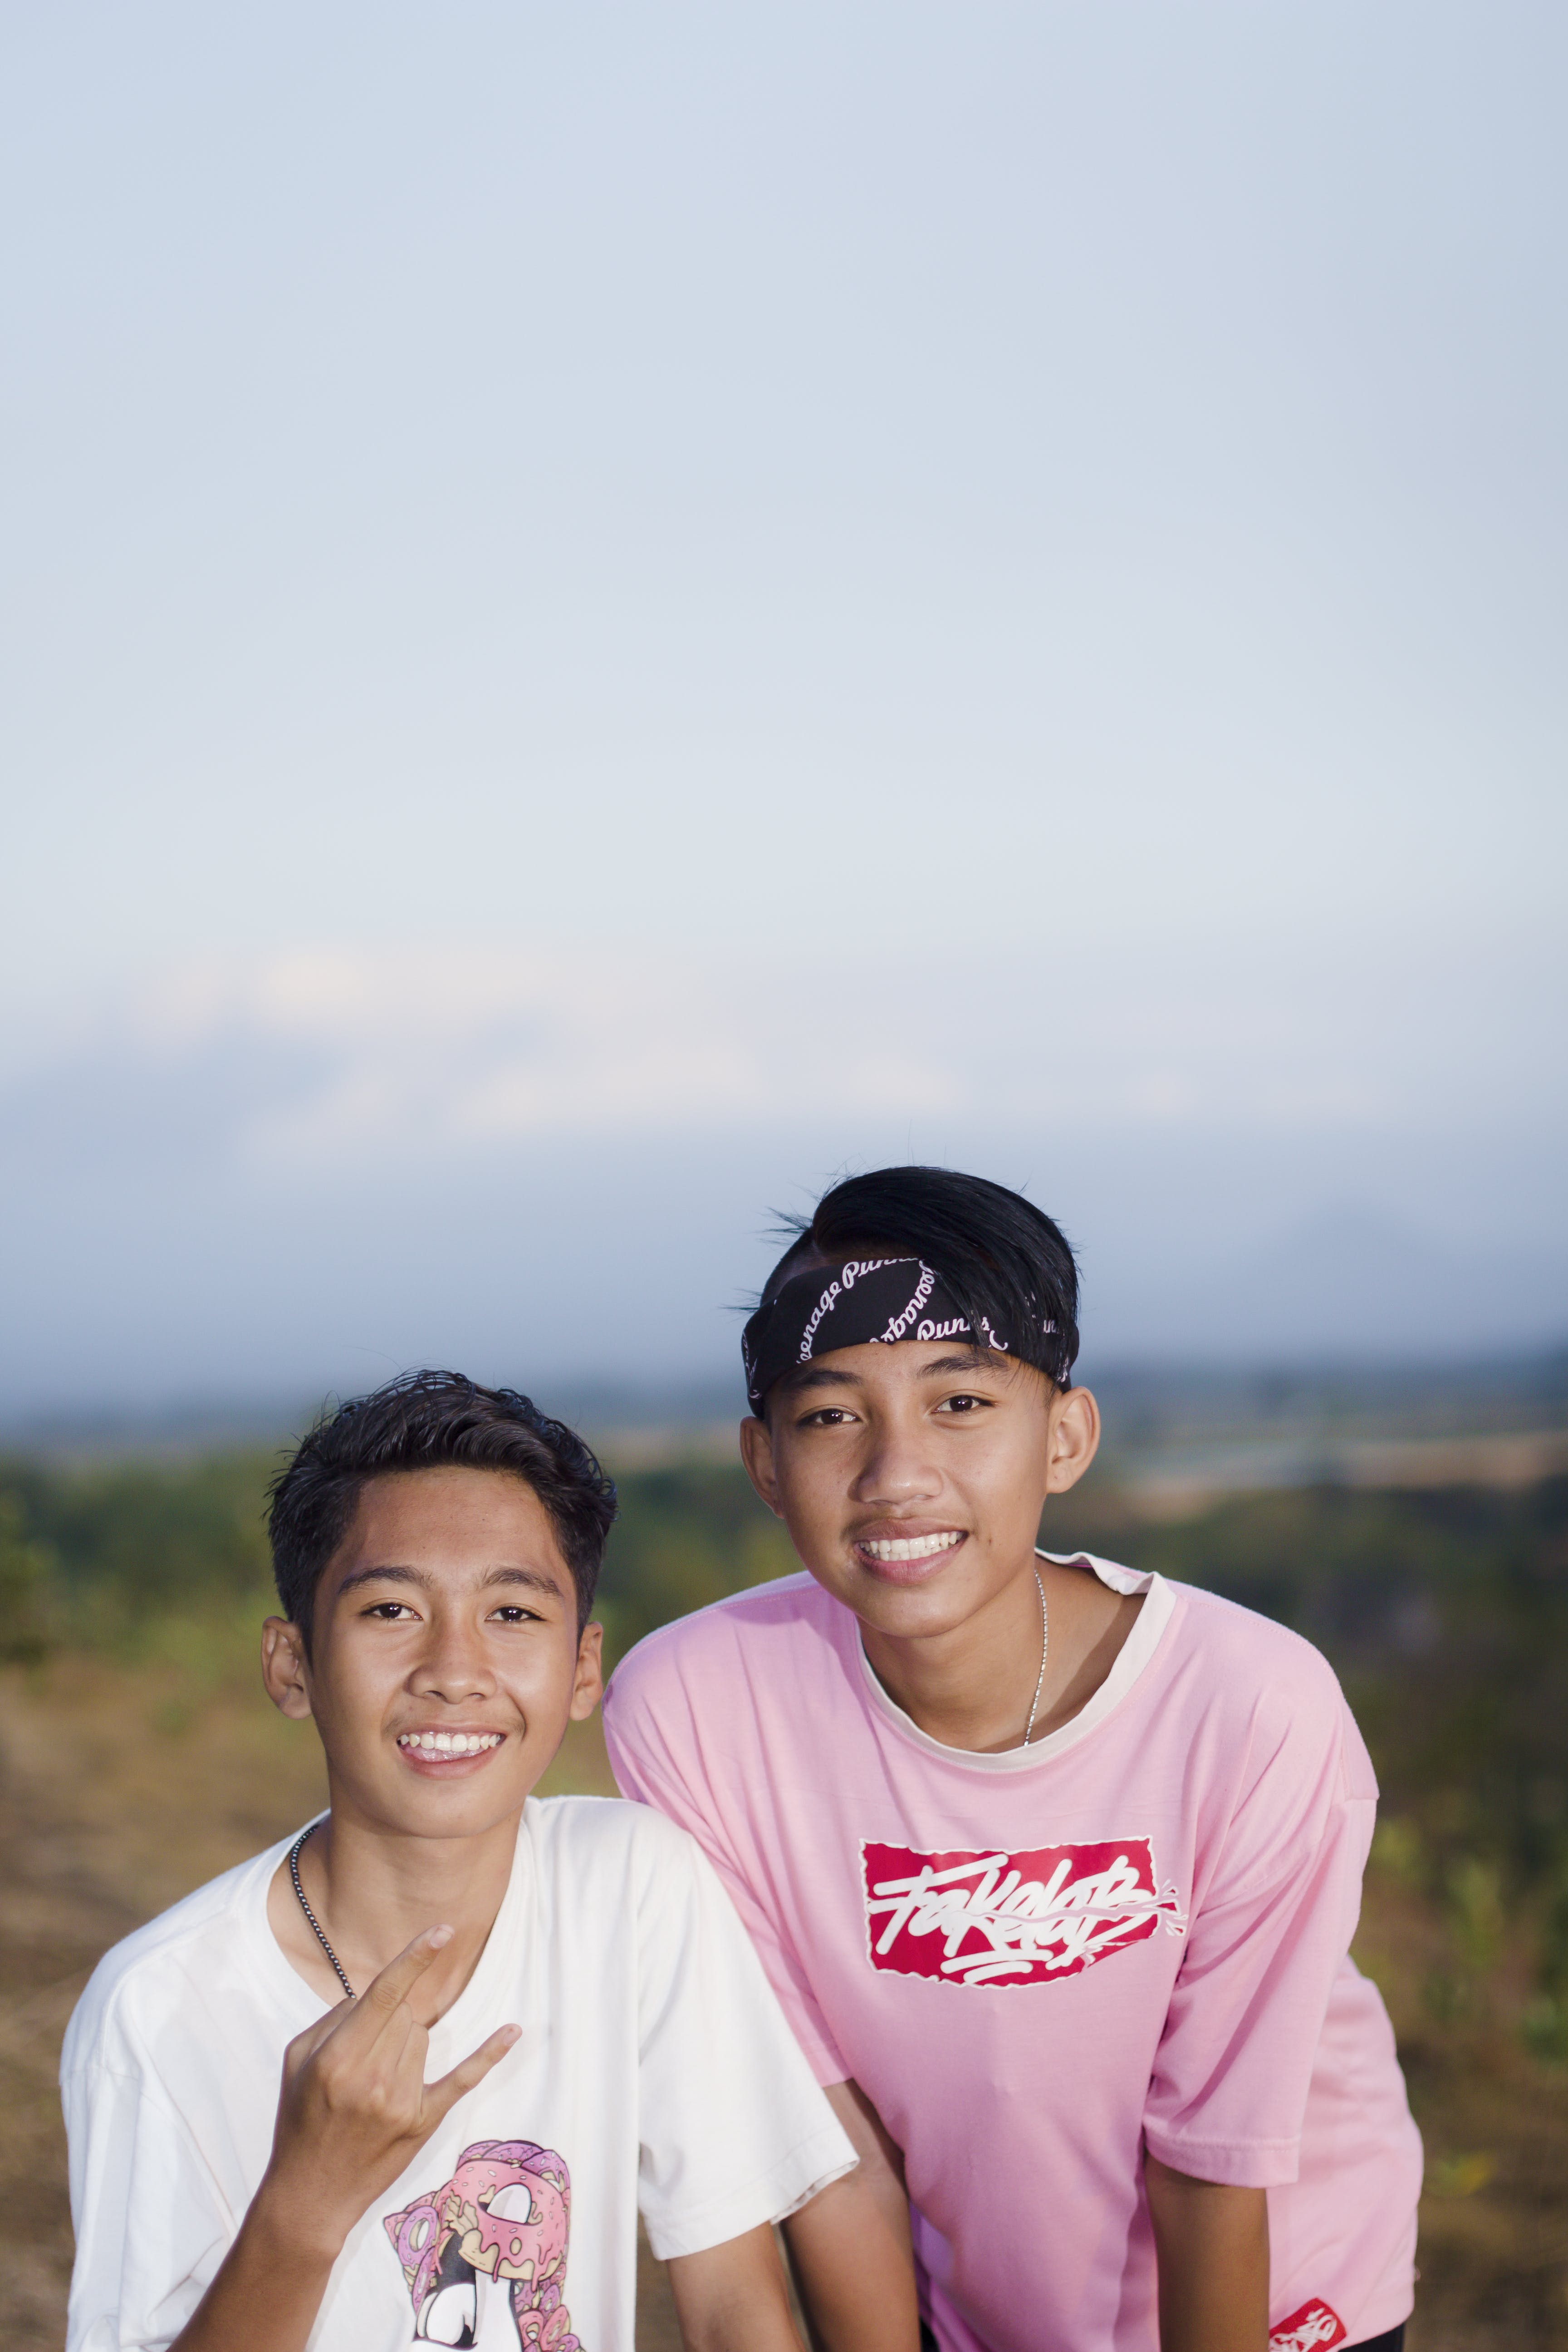 Two Boy's Taking Photo